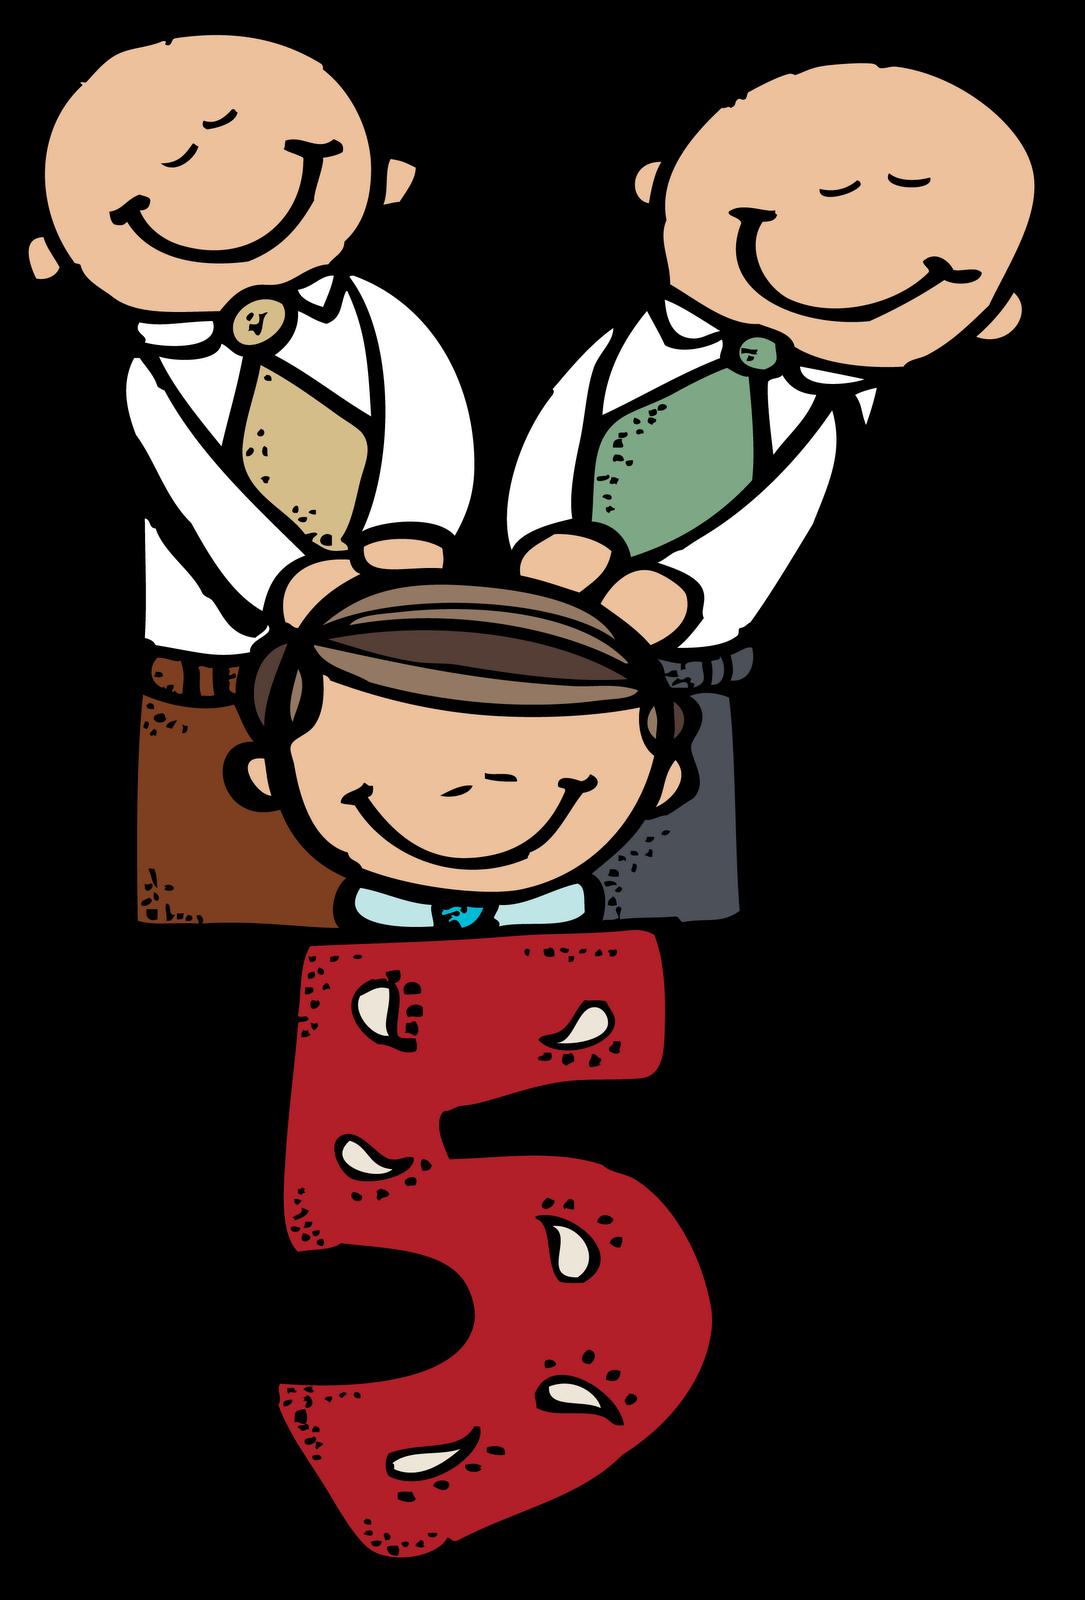 Melonheadz Lds Illustrating Articles Of Faith Illustrations Articles Of Faith Activity Day Girls Lds Kids